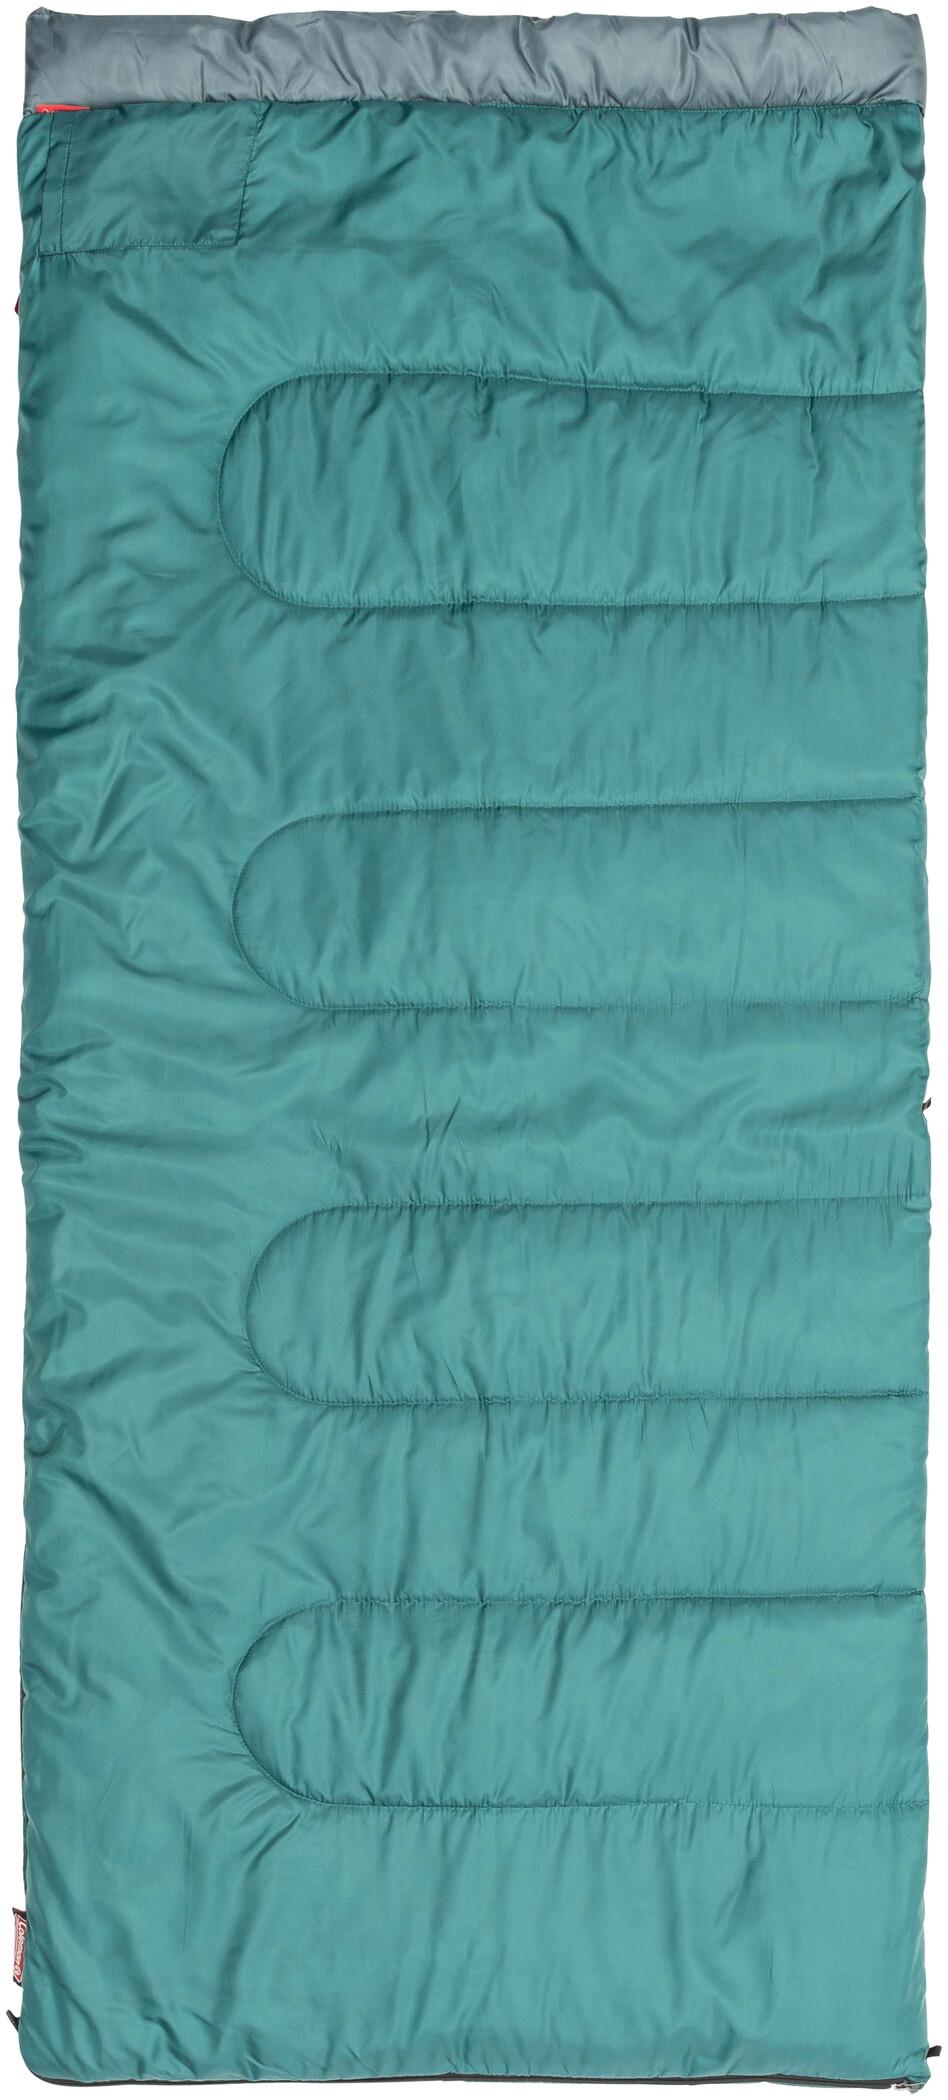 Coleman Atlantic Lite 10 Sleeping Bag, petrol (2019) | Misc. Transportation and Storage